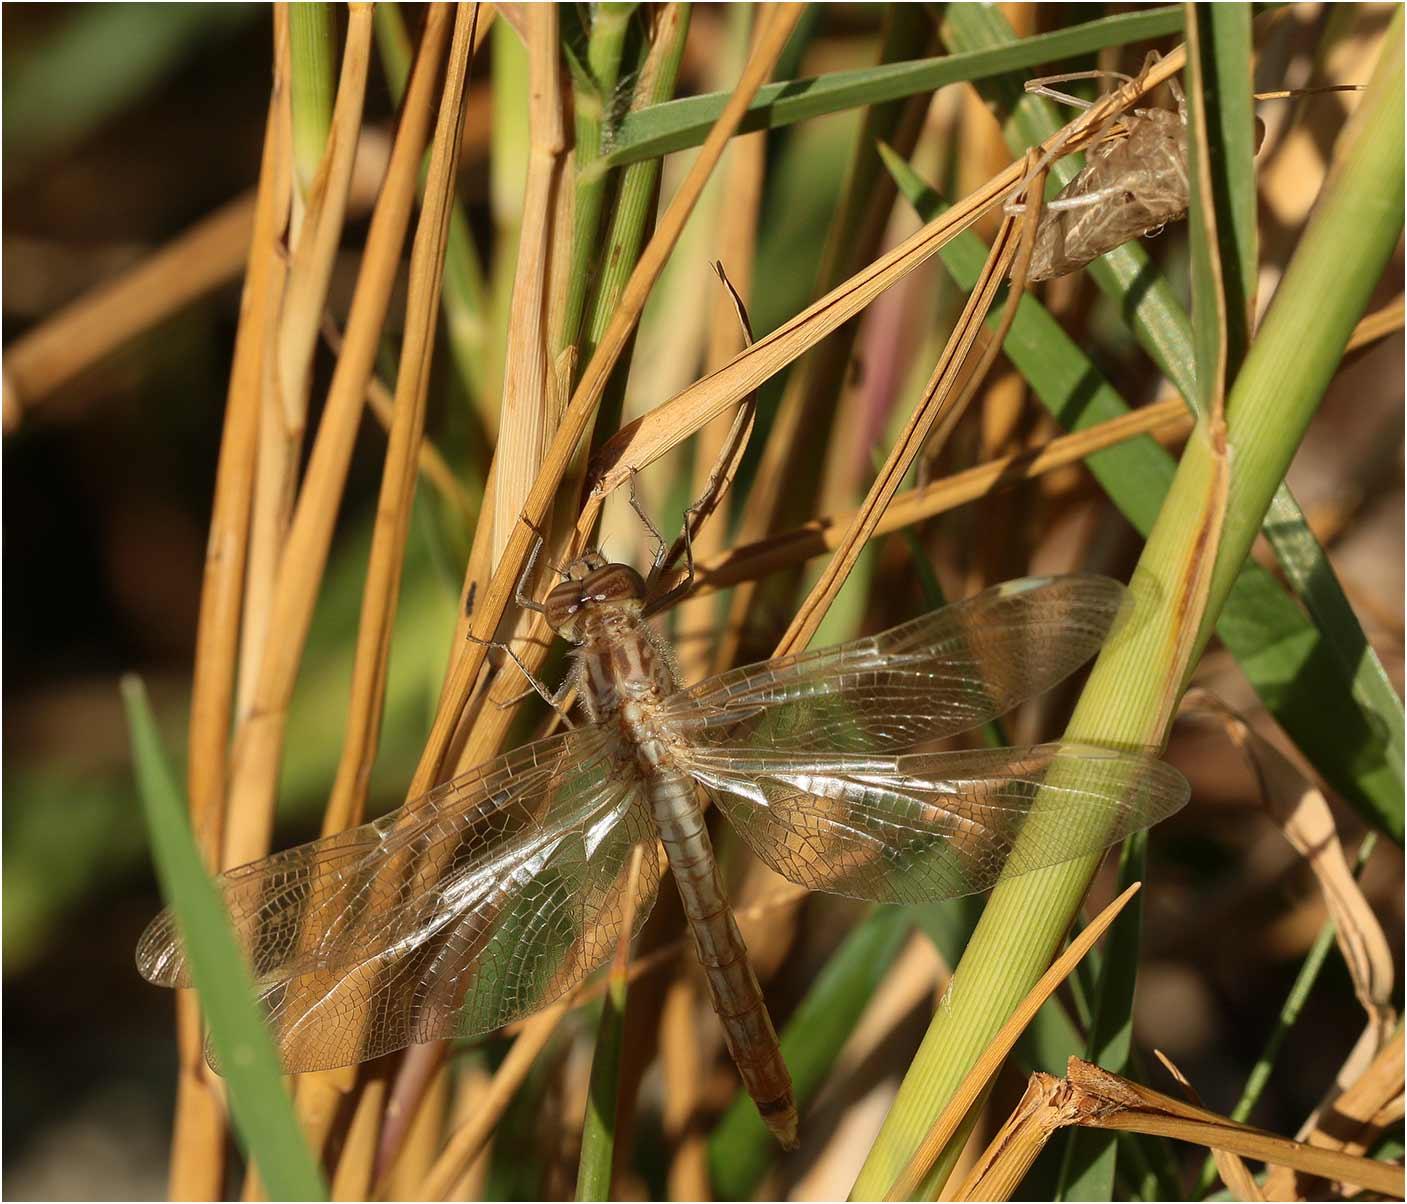 Brachythemis impartita mâle émergent, lac Langano, 01/11/2018